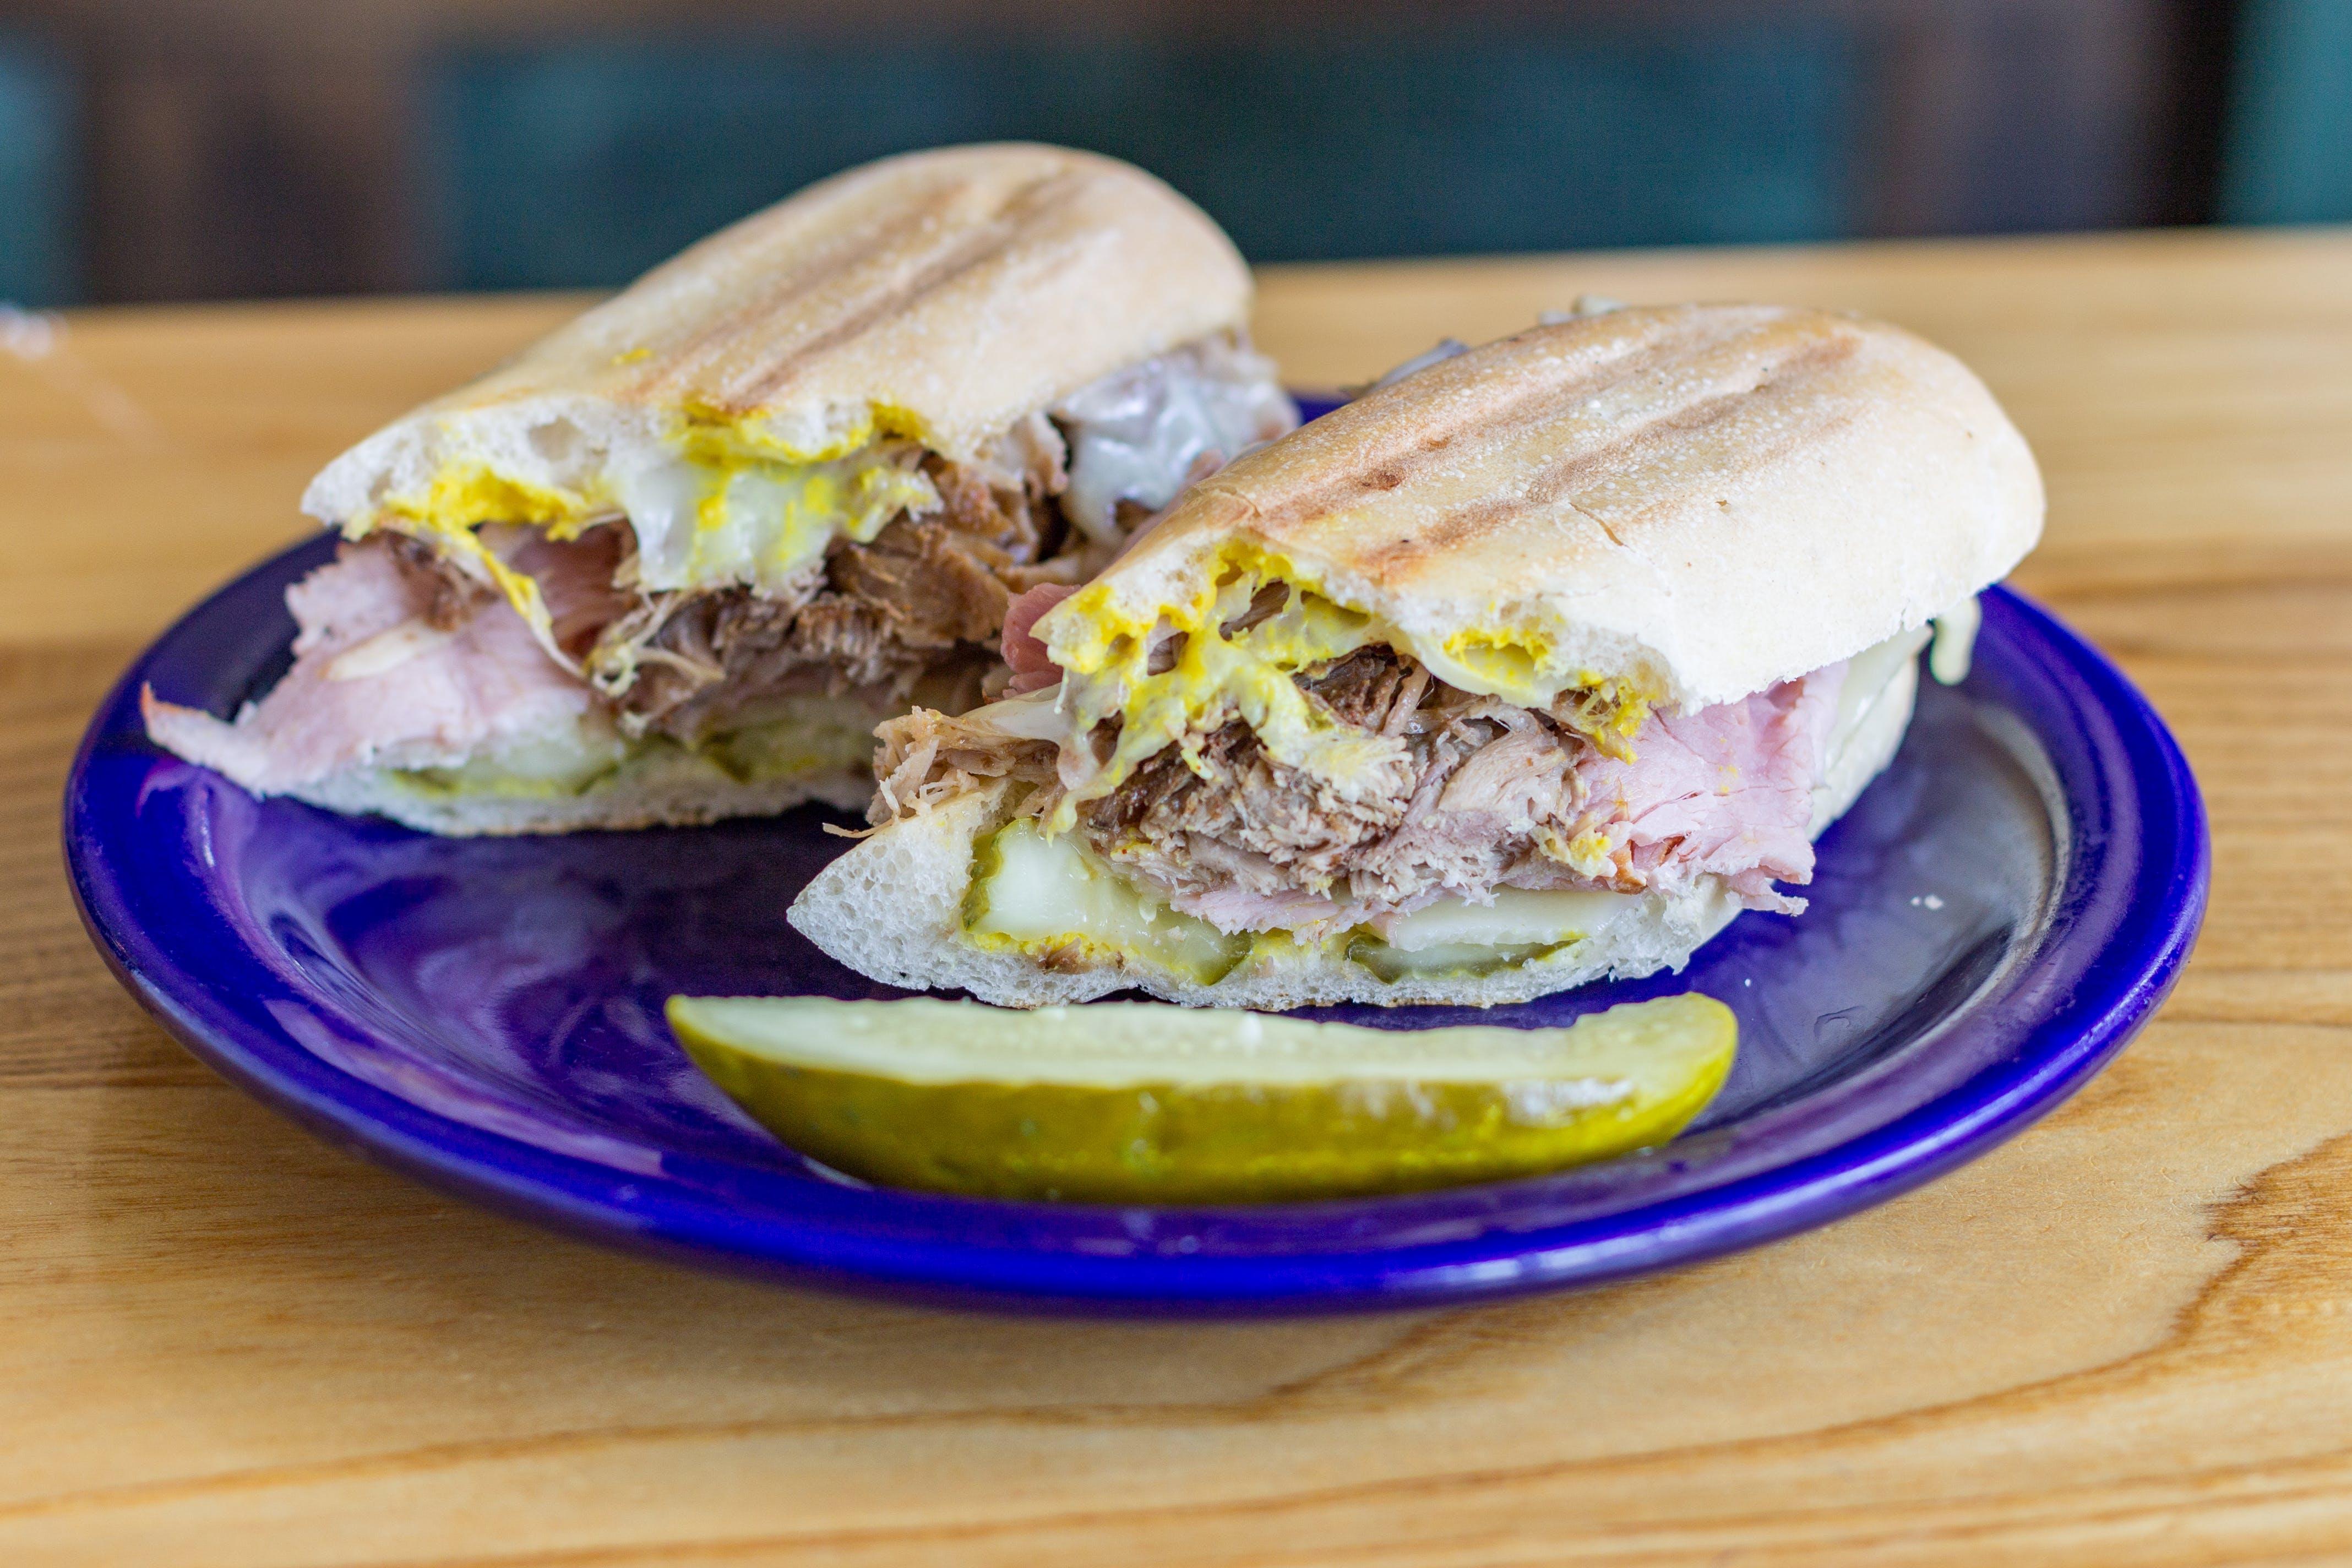 The Cubano Sandwich from Bodega Brew Pub in La Crosse, WI